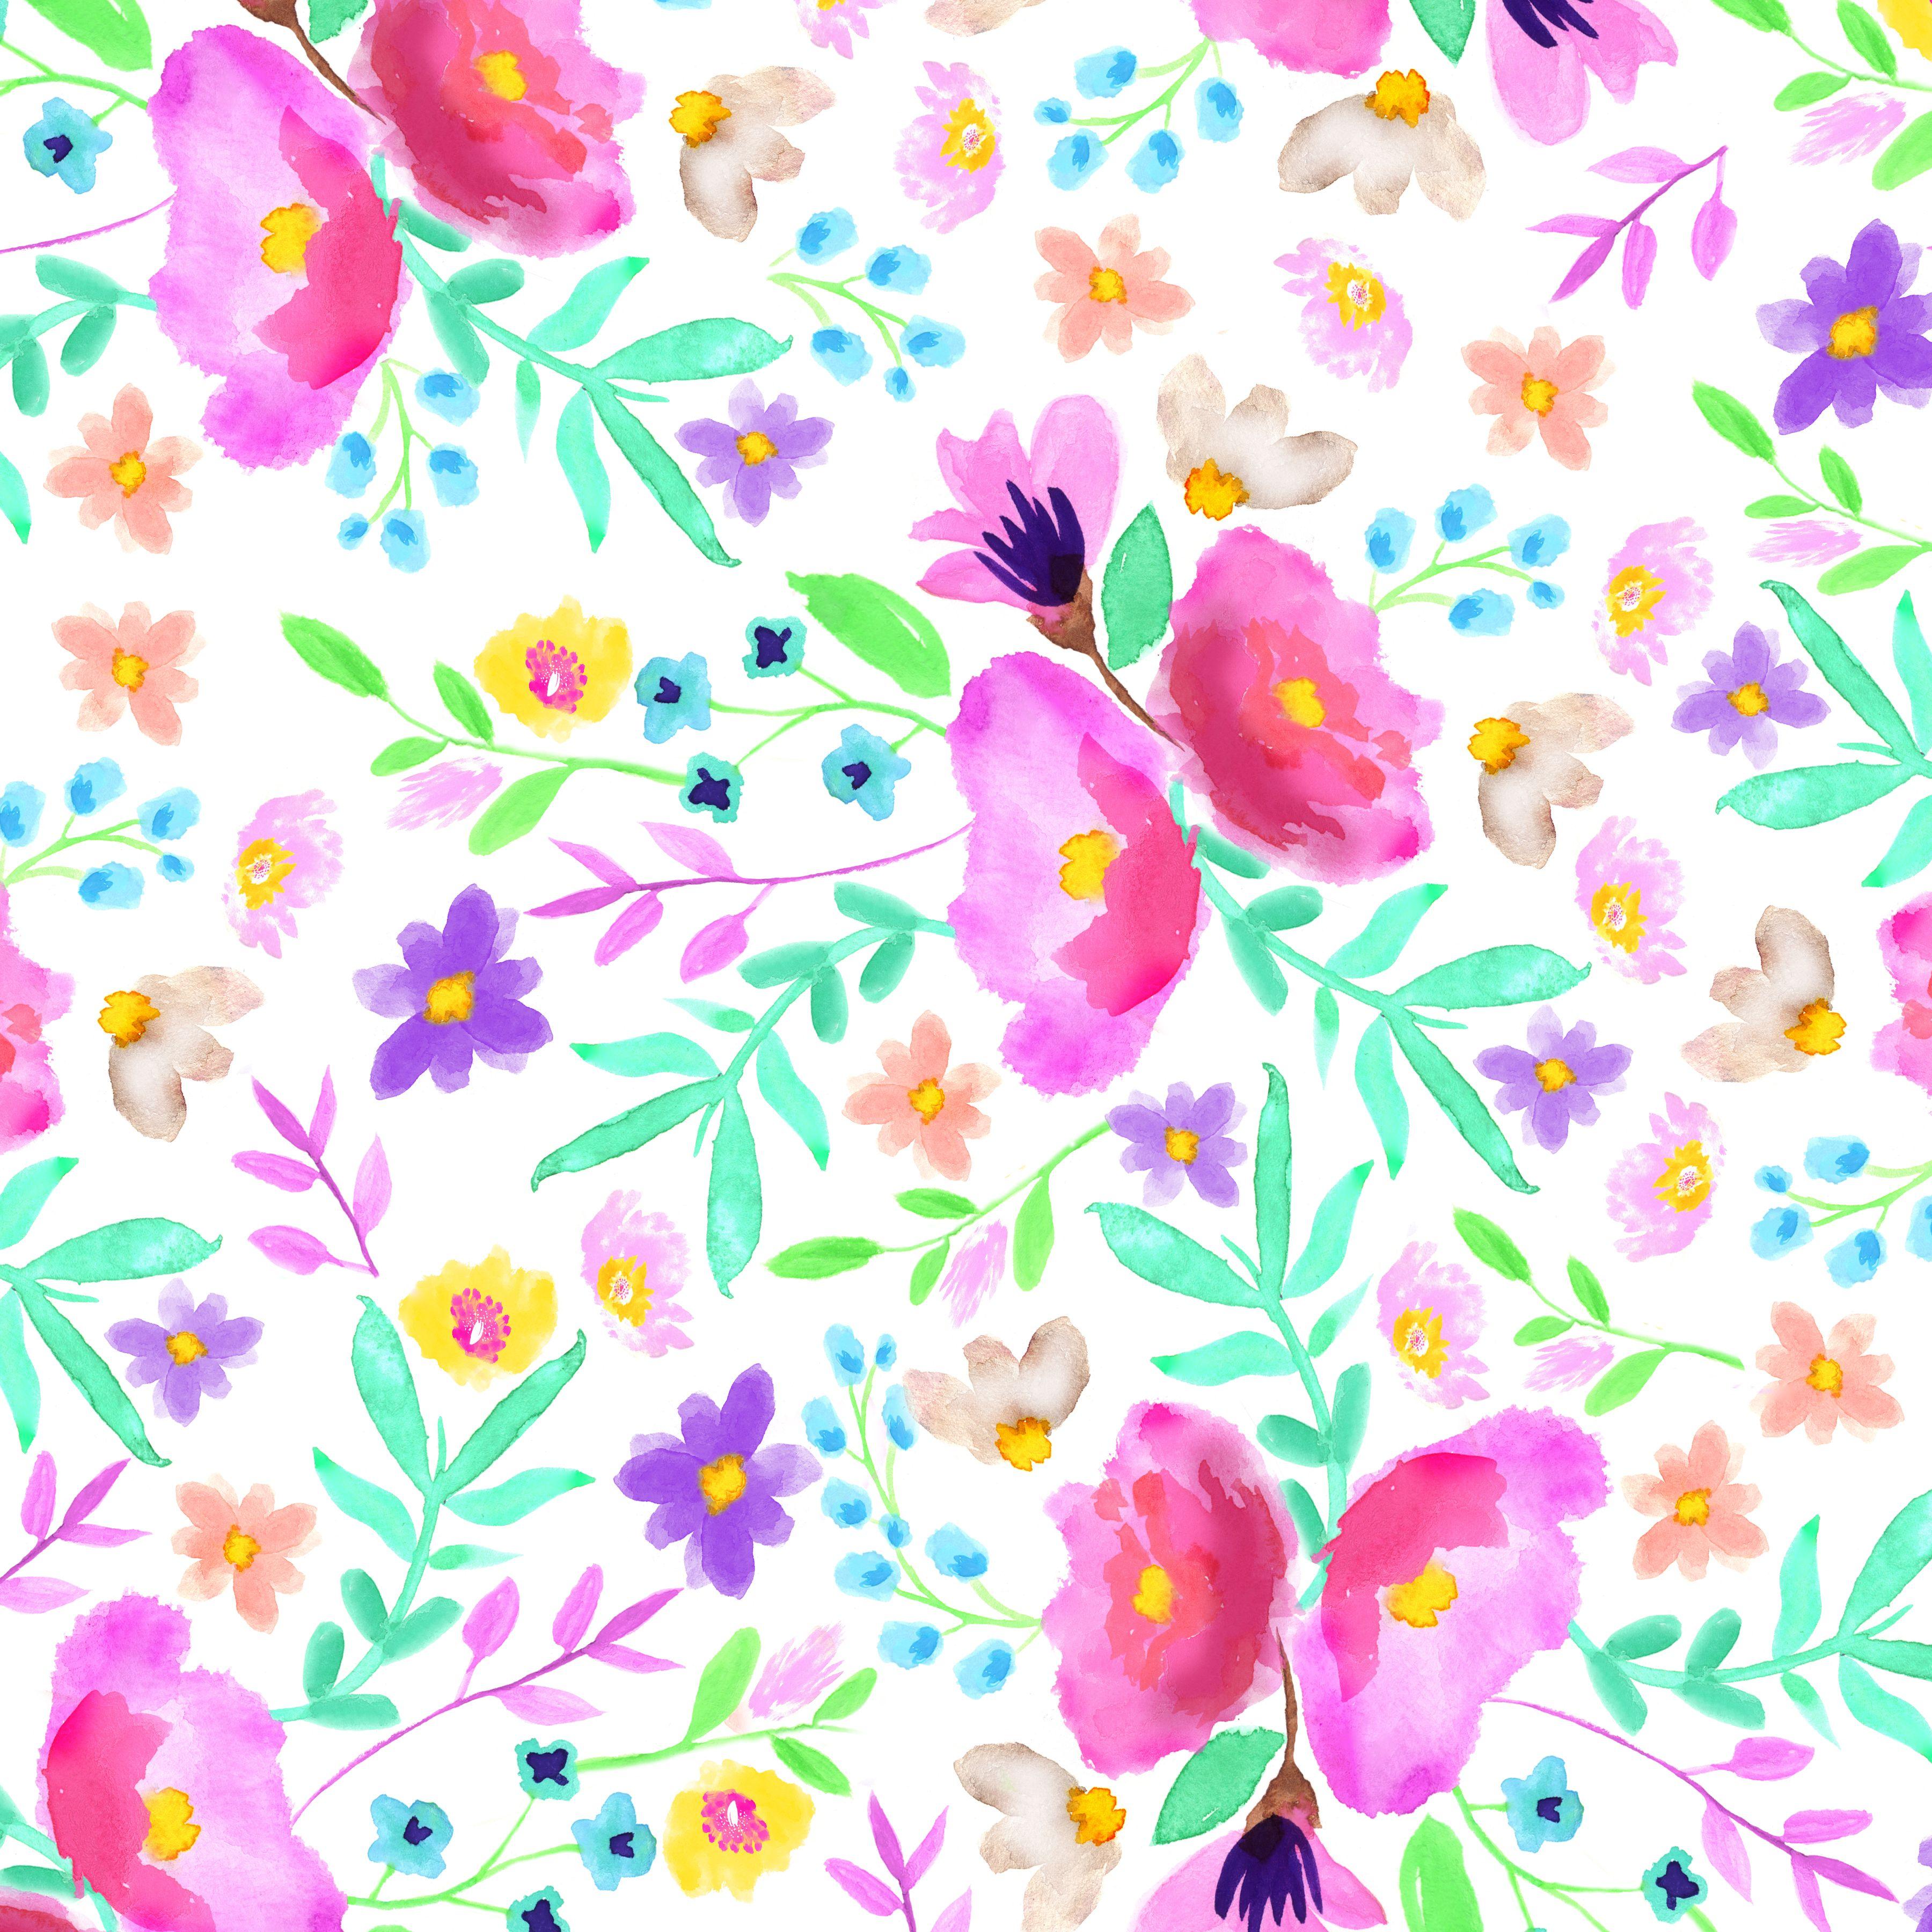 How to scrapbook flowers - Watercolor Flower Digital Scrapbooking Paper Fptfy 1 Jpg 3 600